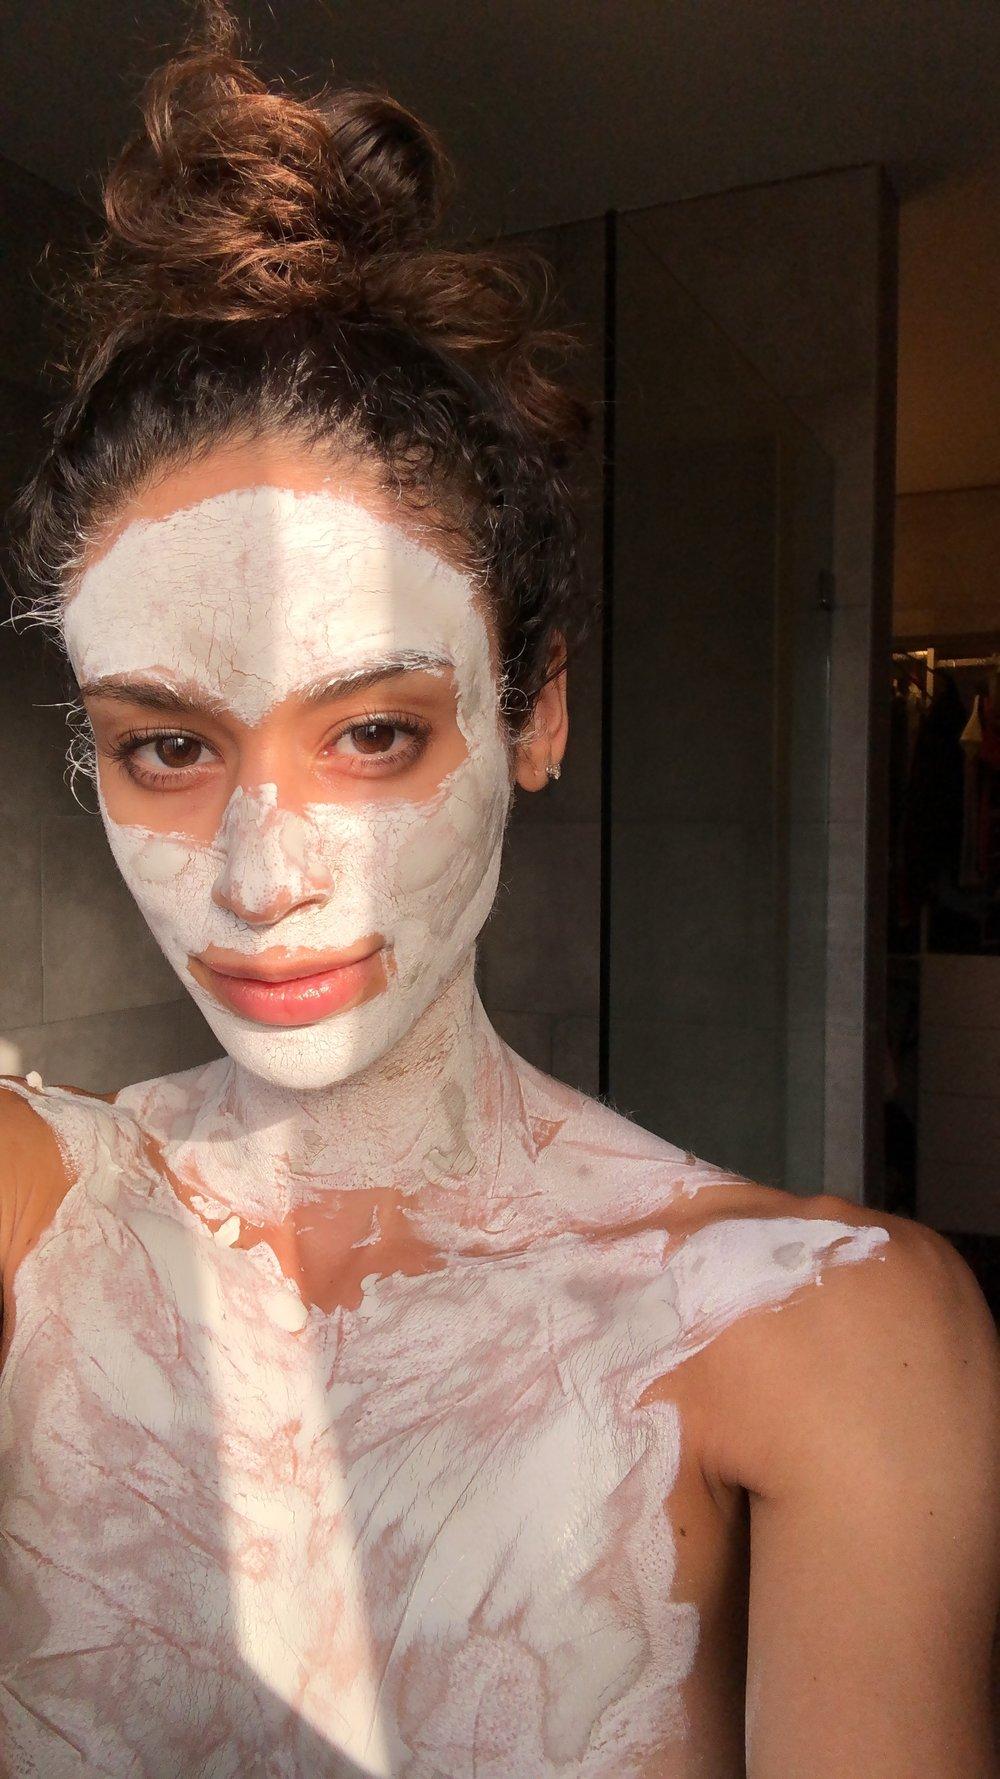 When you take masking seriously…